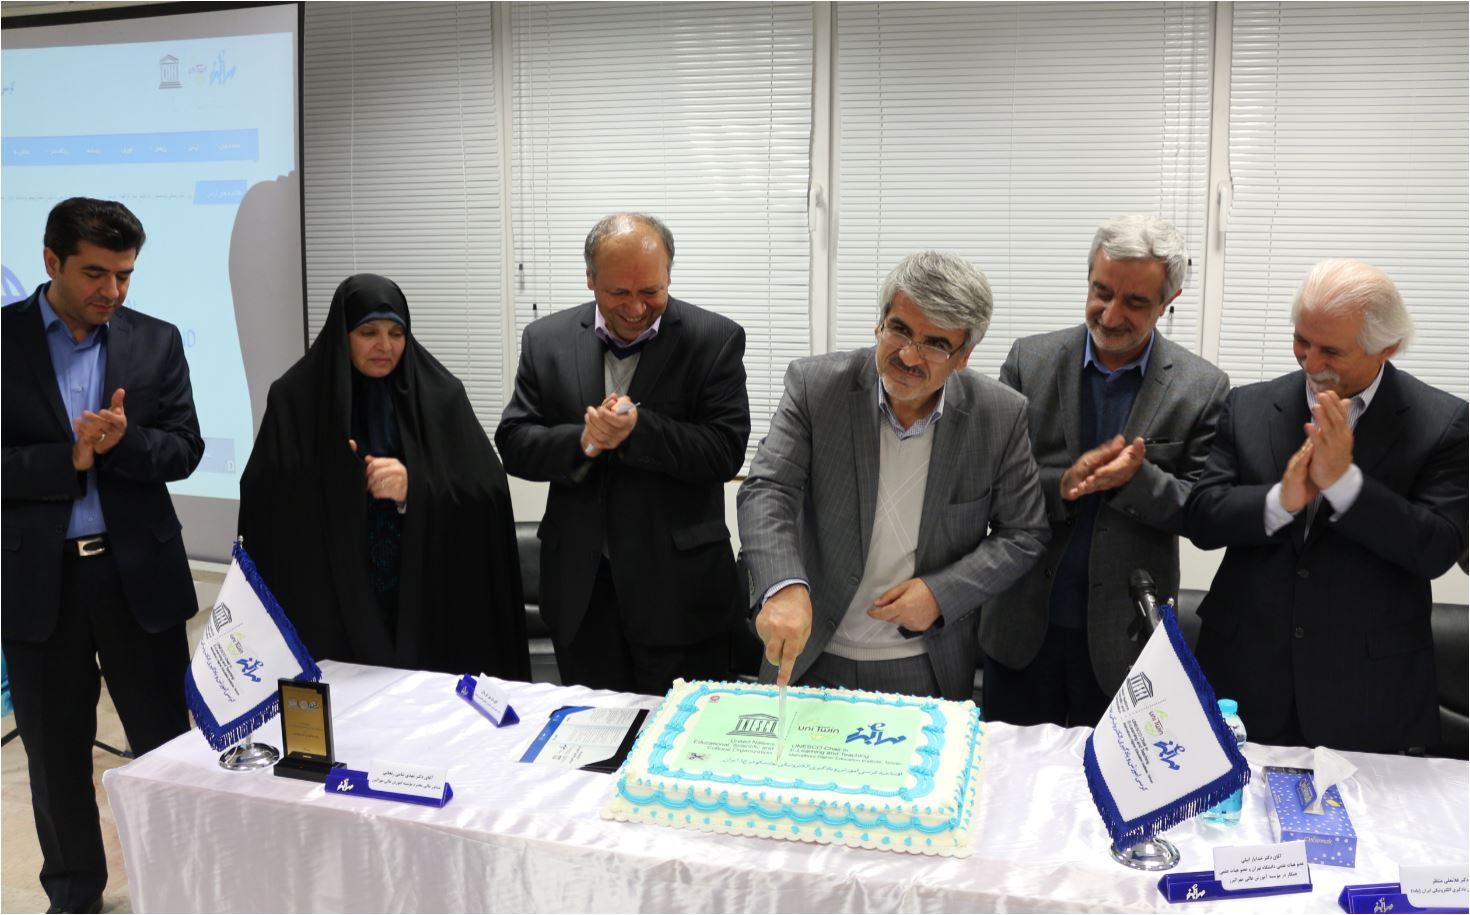 http://ucet.irمراسم افتتاح کرسی آموزش و یادگیری الکترونیکی یونسکو